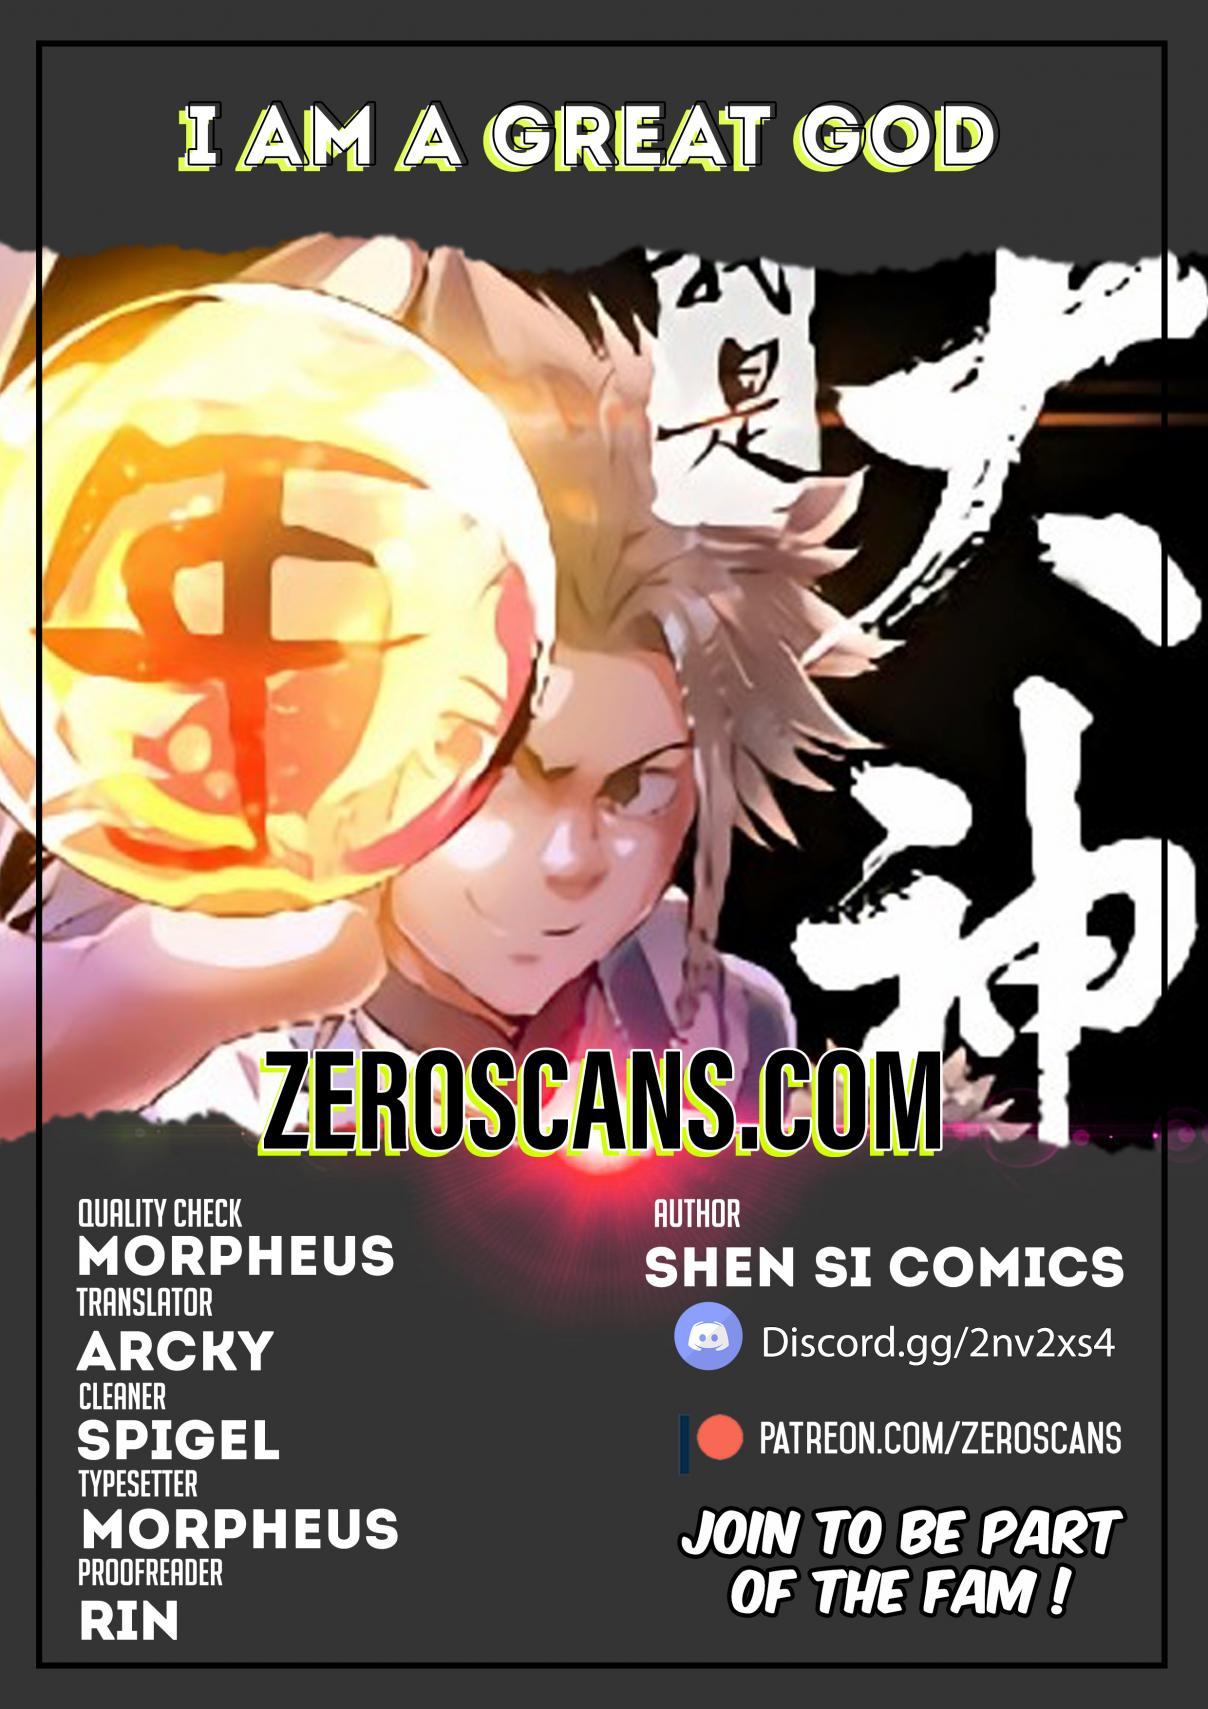 https://im.nineanime.com/comics/pic9/4/21124/491115/573c57272d4dec500465daeb683f4958.jpg Page 1